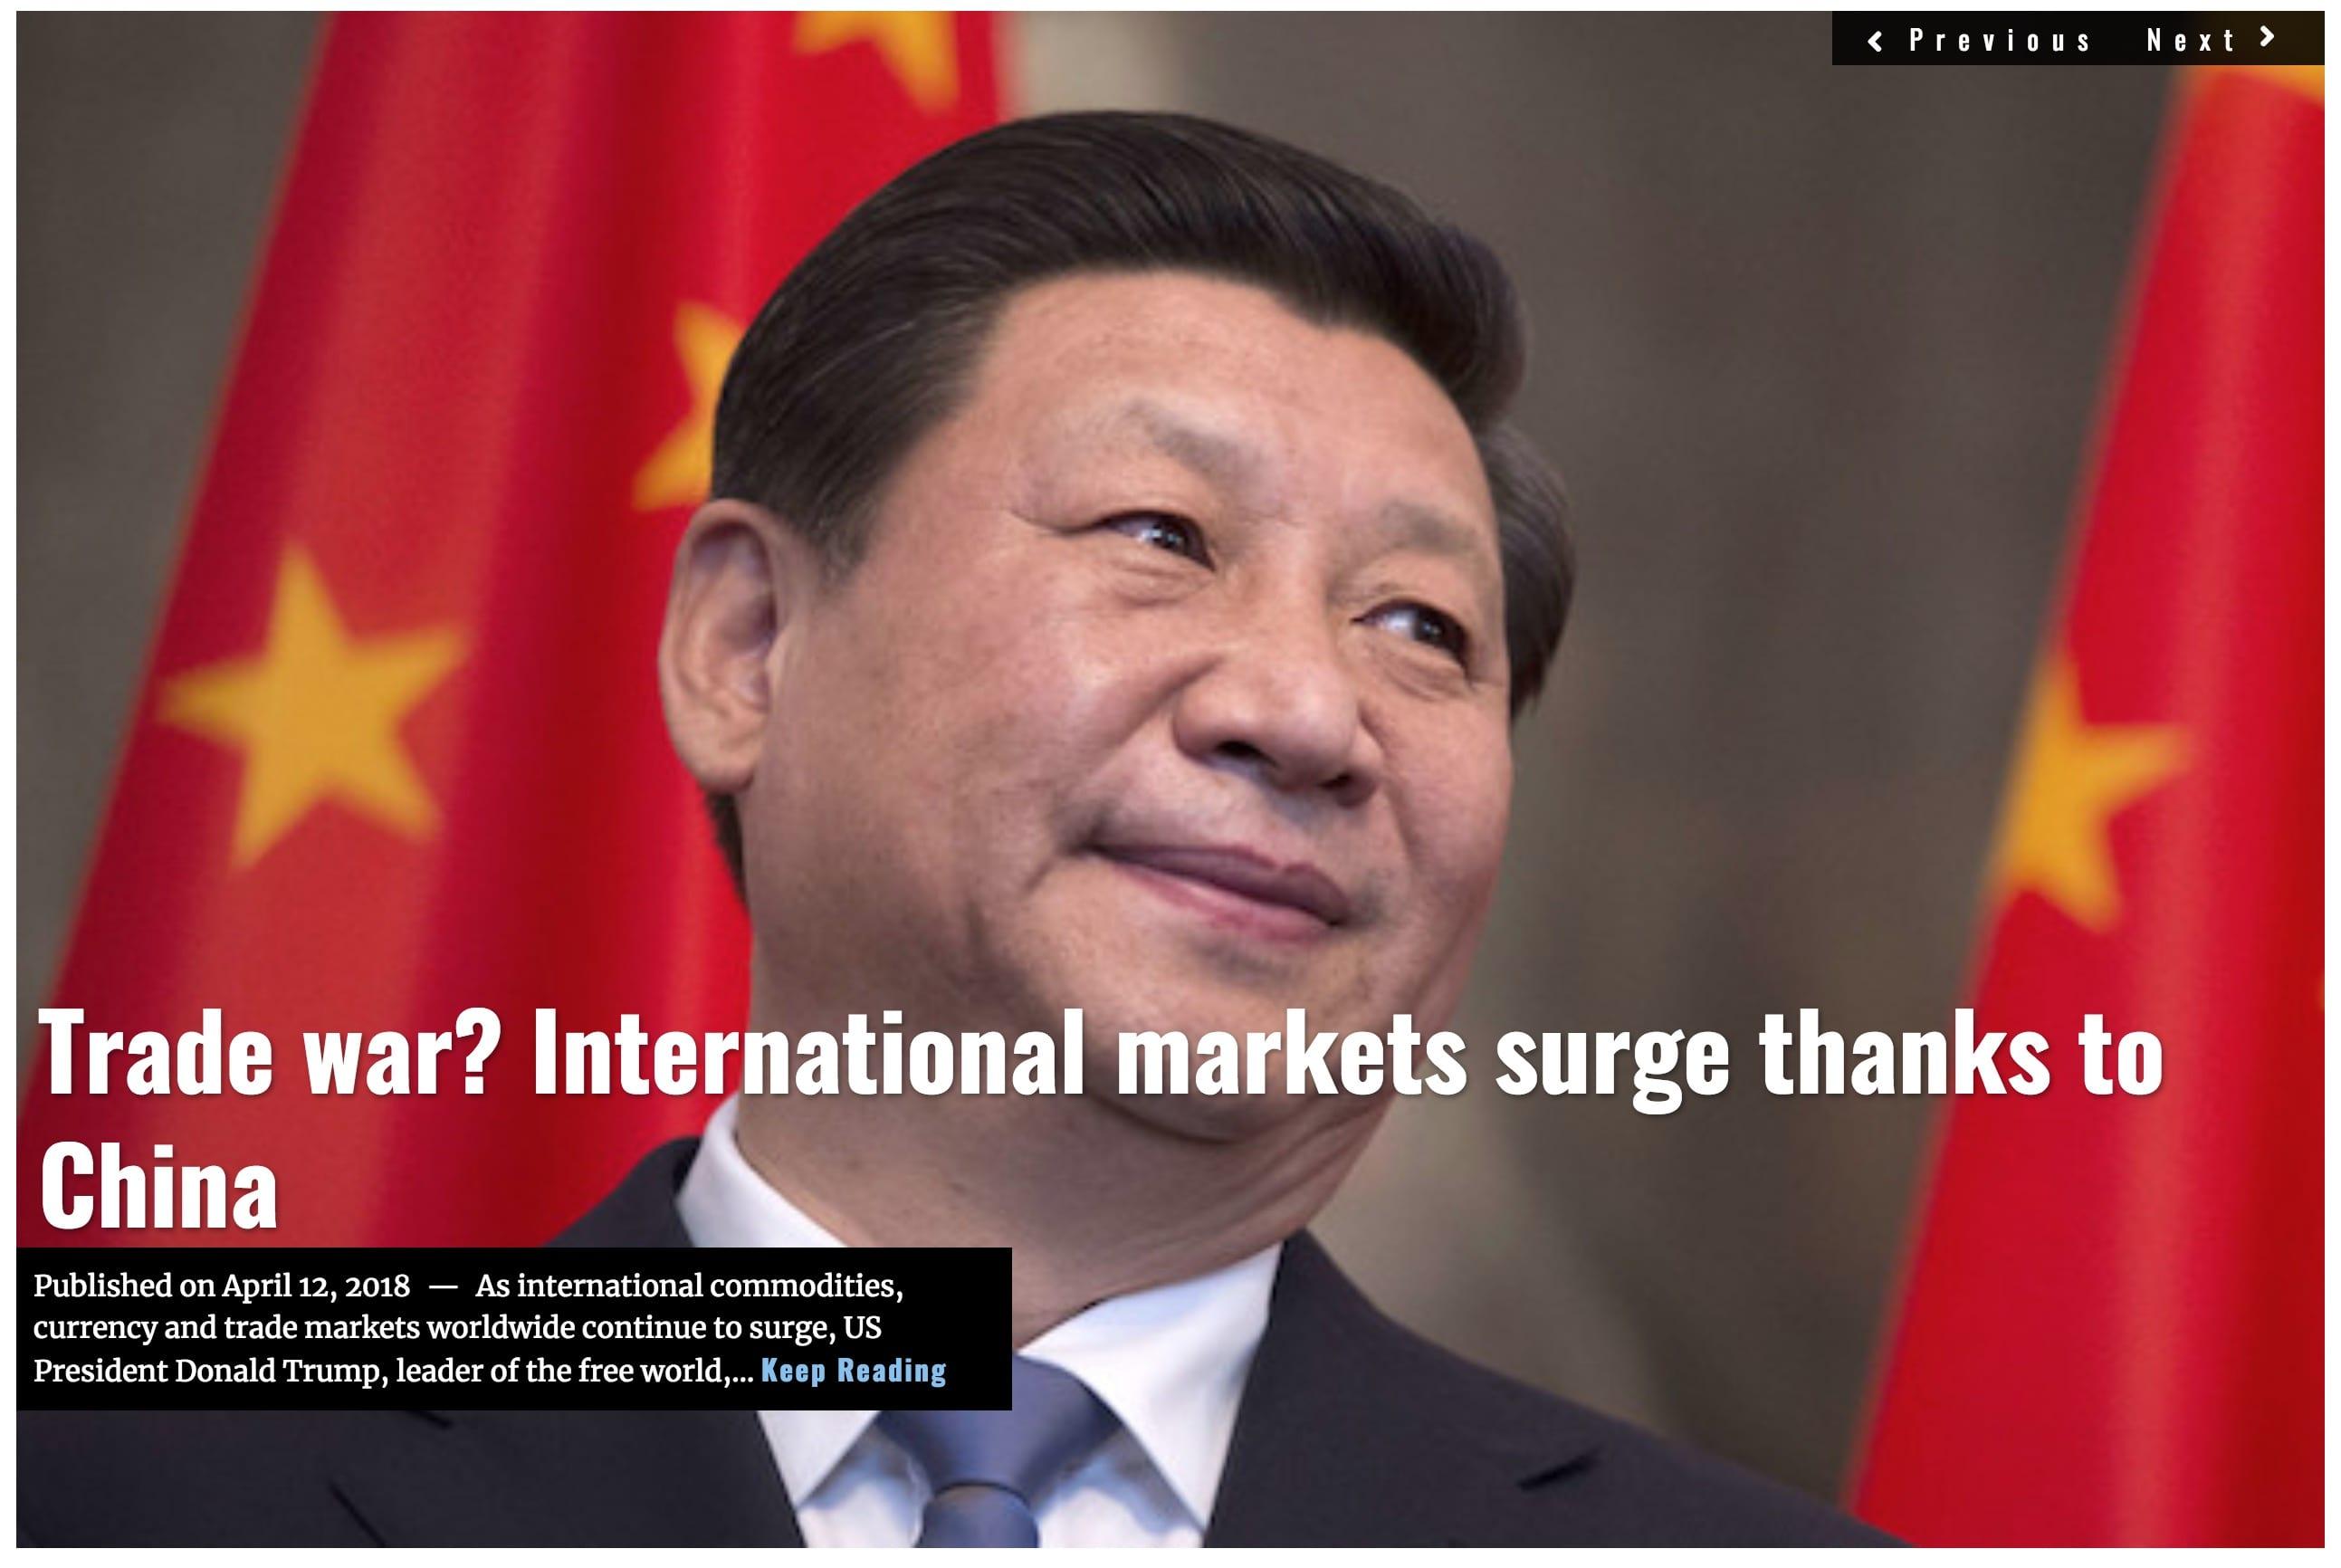 Image Lima Charlie News Headline Trade War China J.Sjoholm APR 12 2018